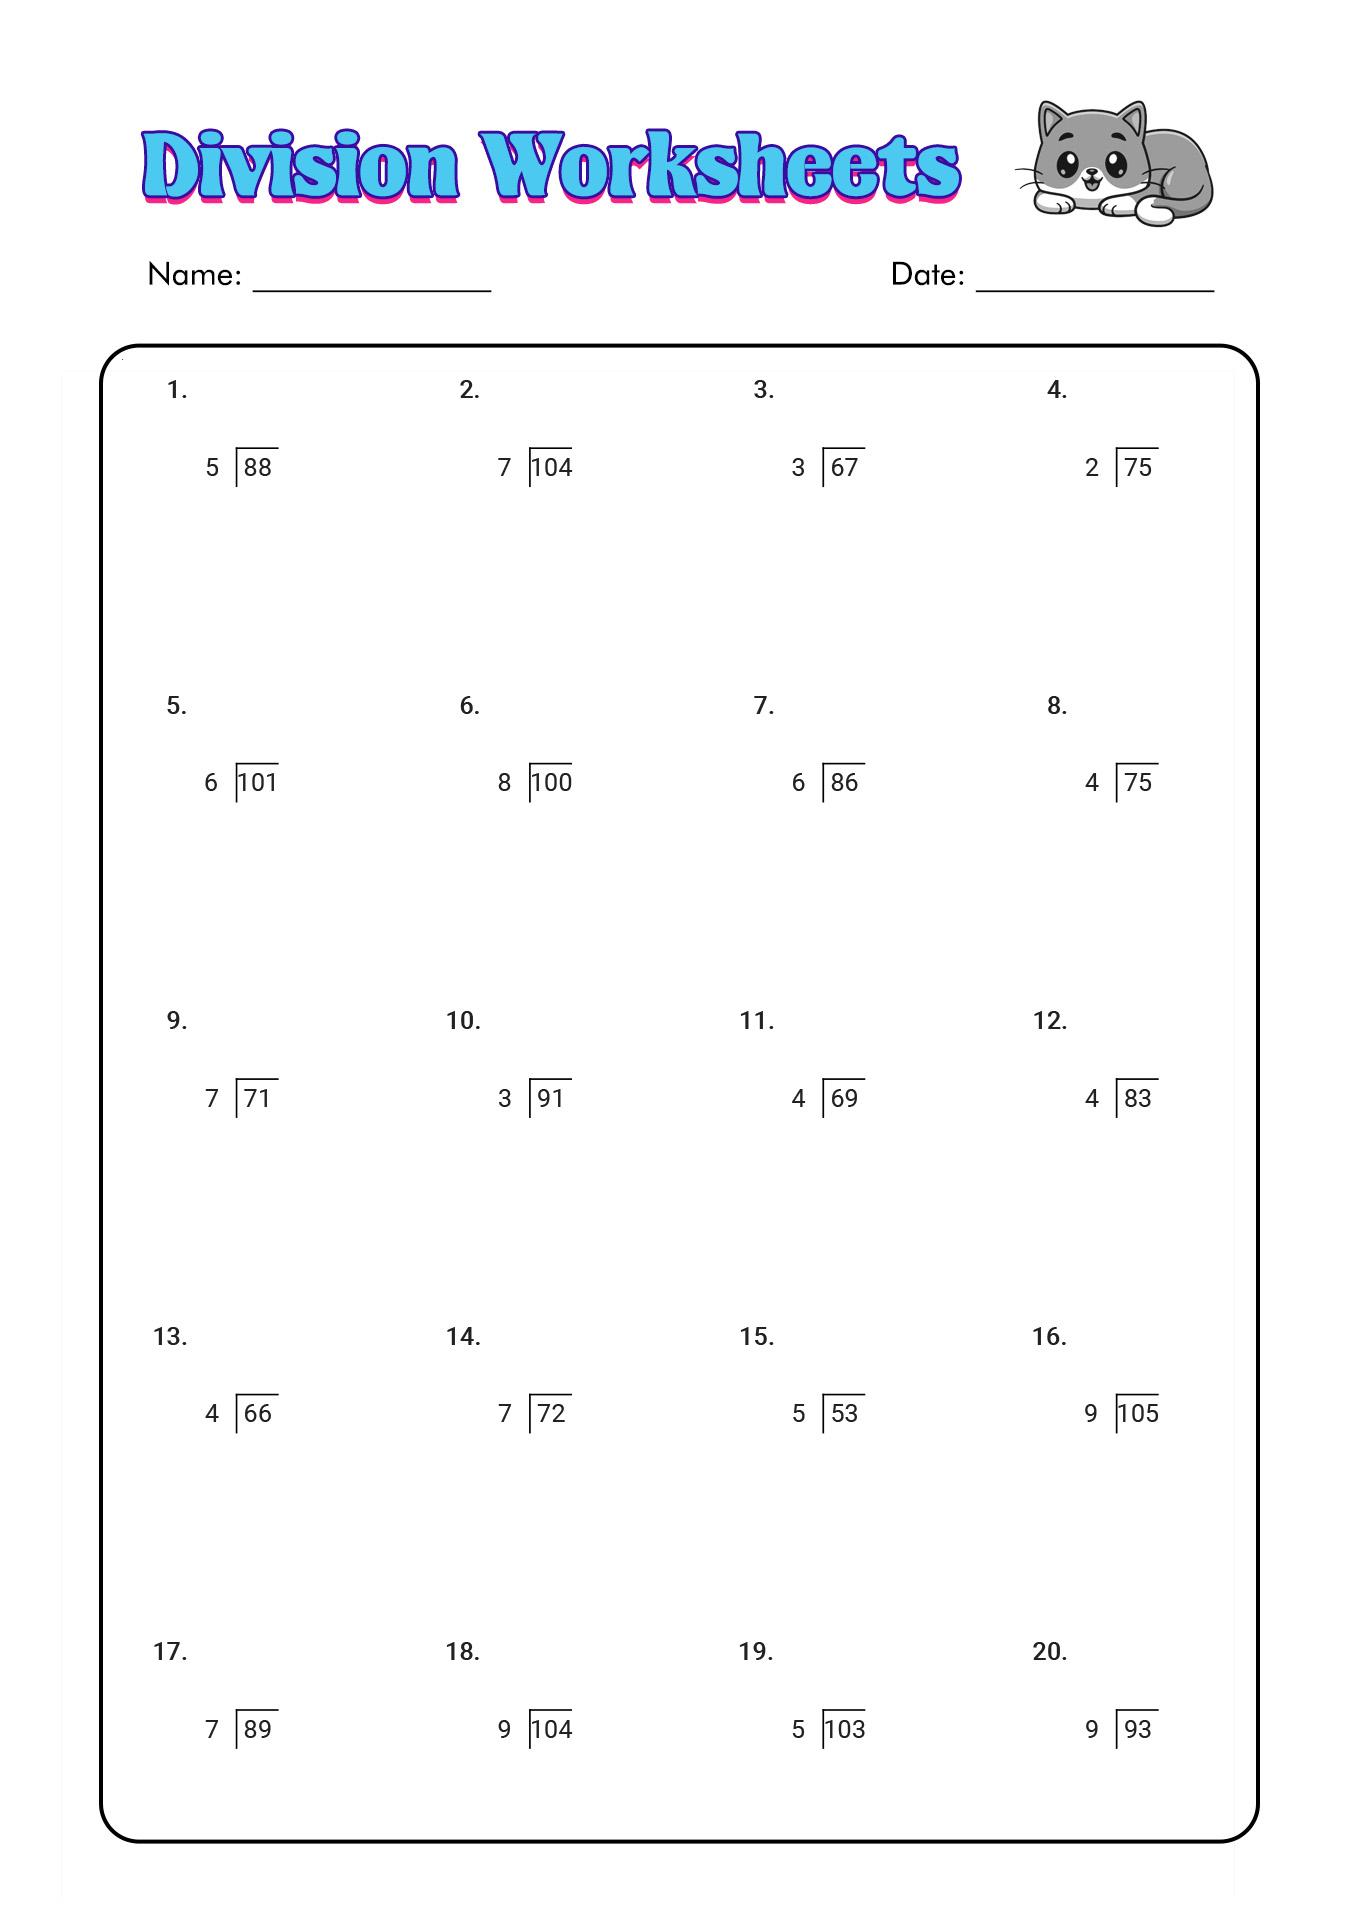 12 Best Images of 3rd Grade Math Division Worksheets